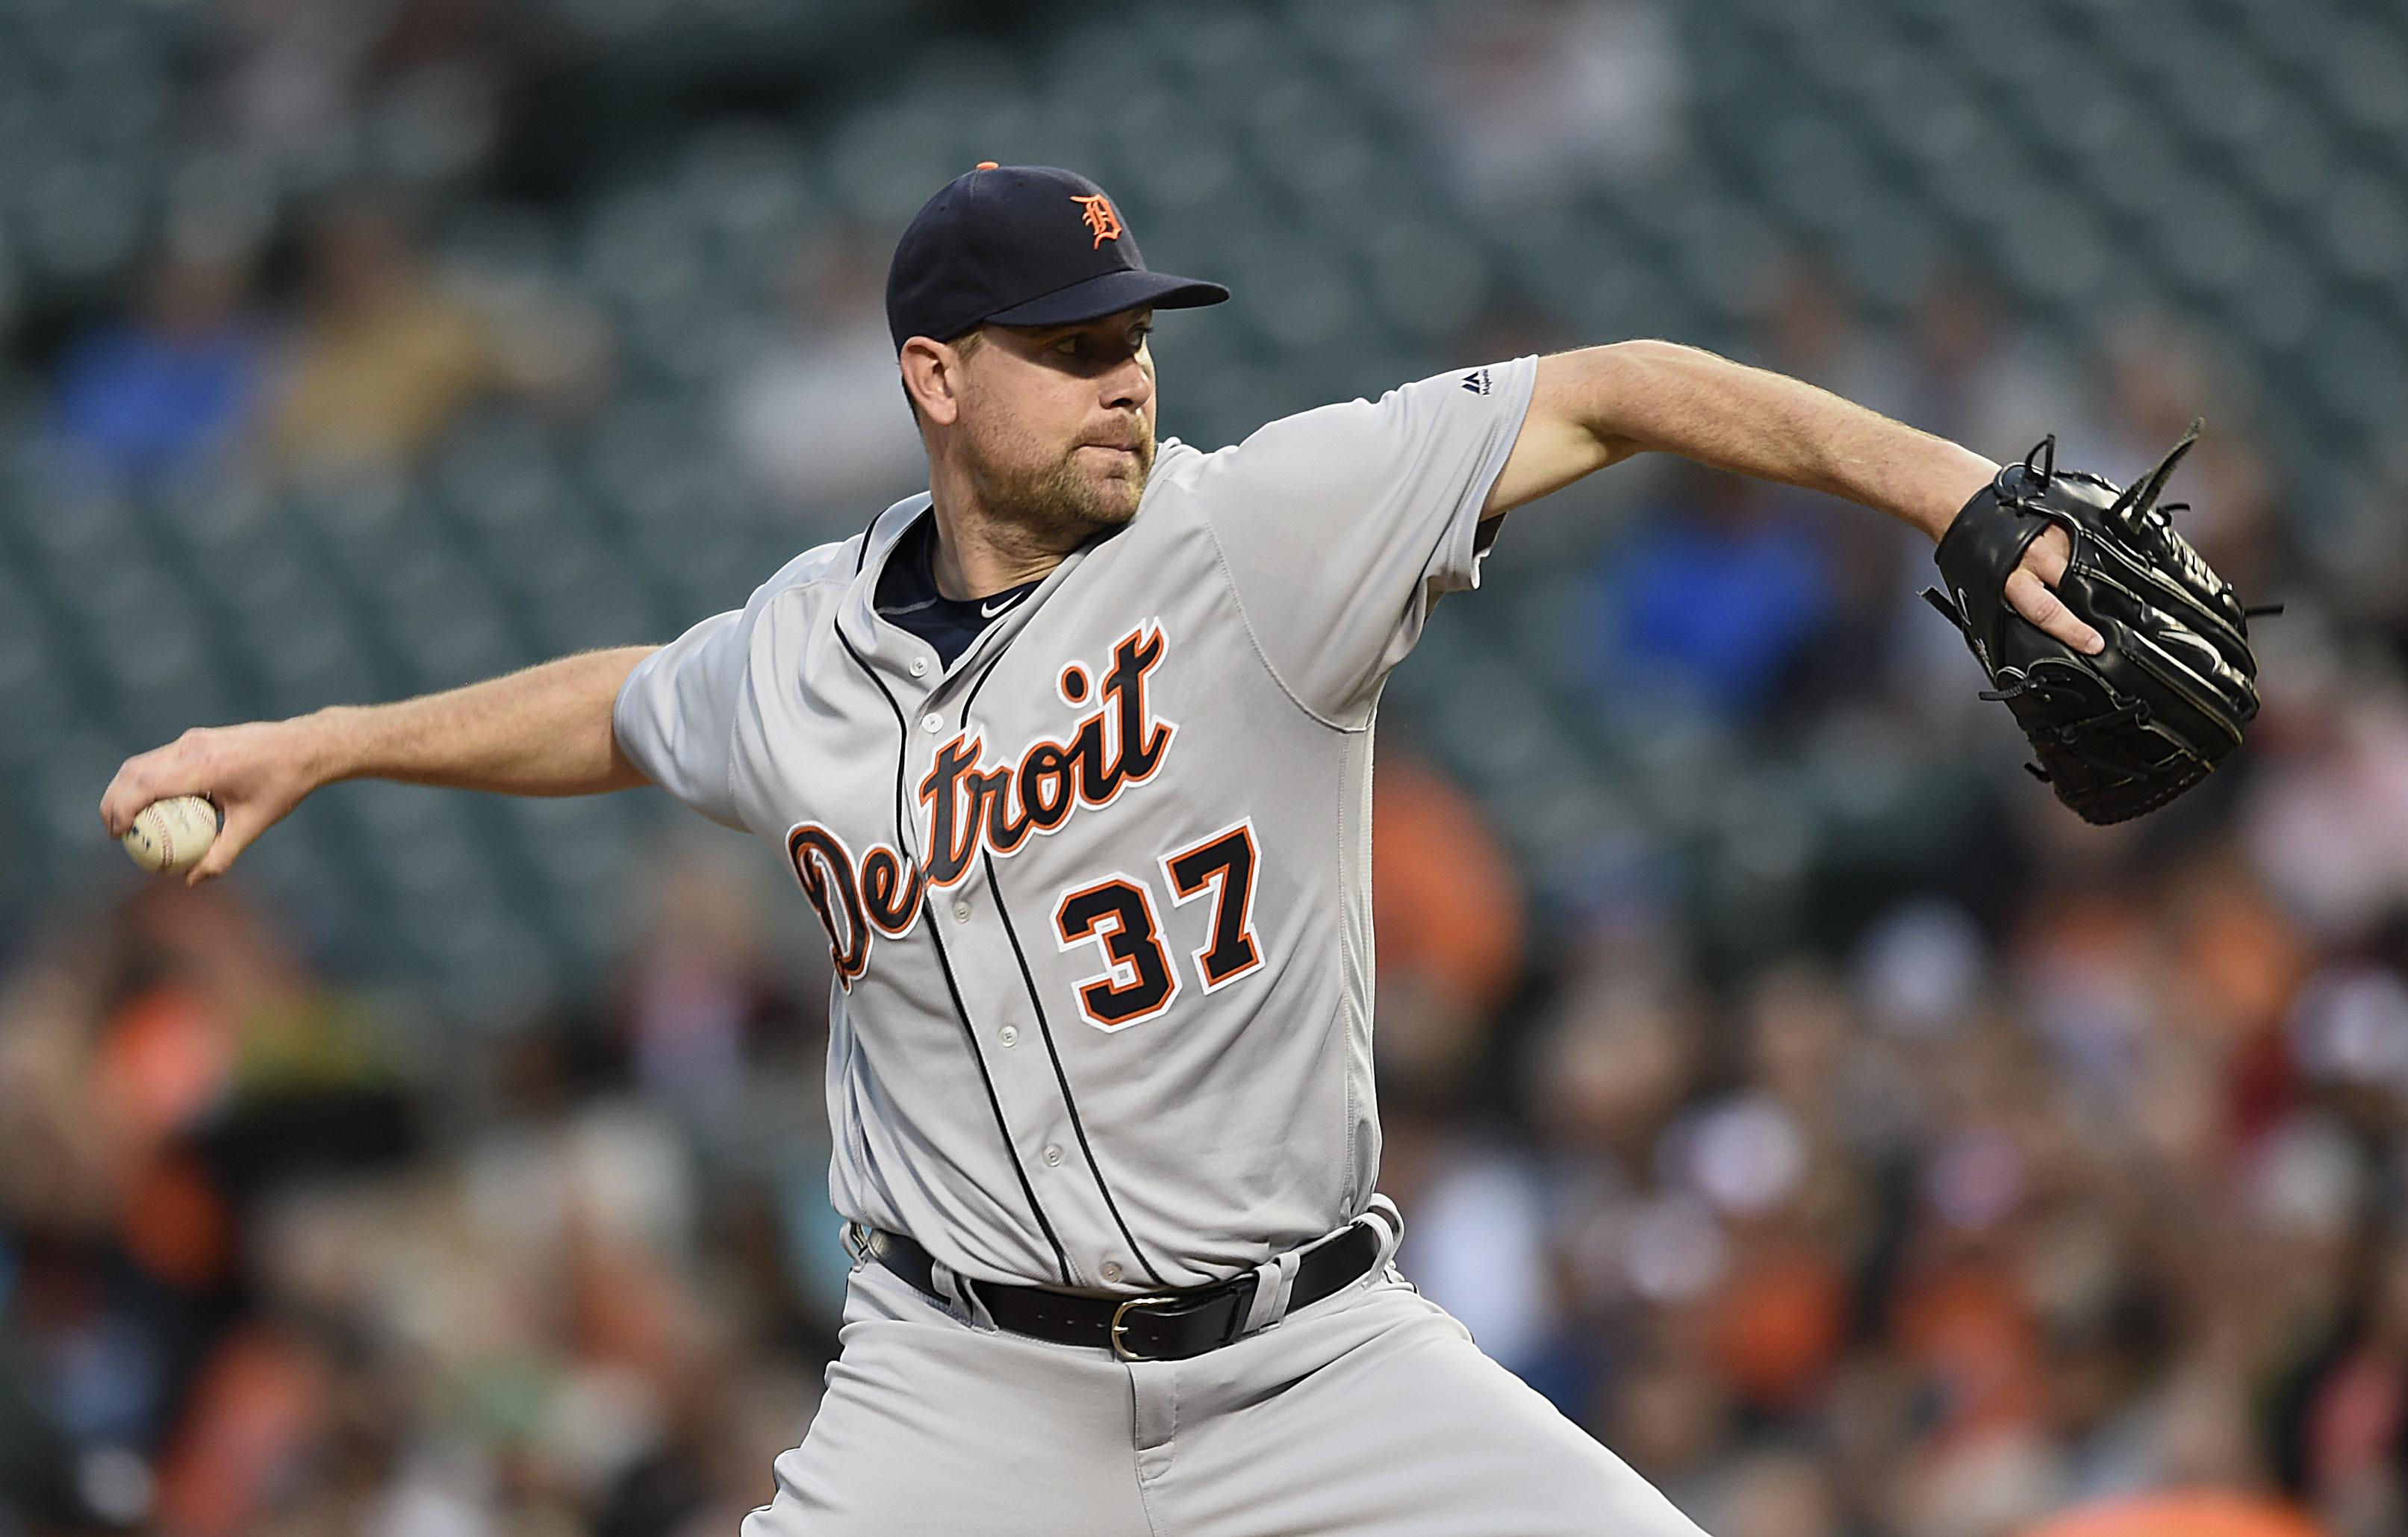 Tigers_orioles_baseball